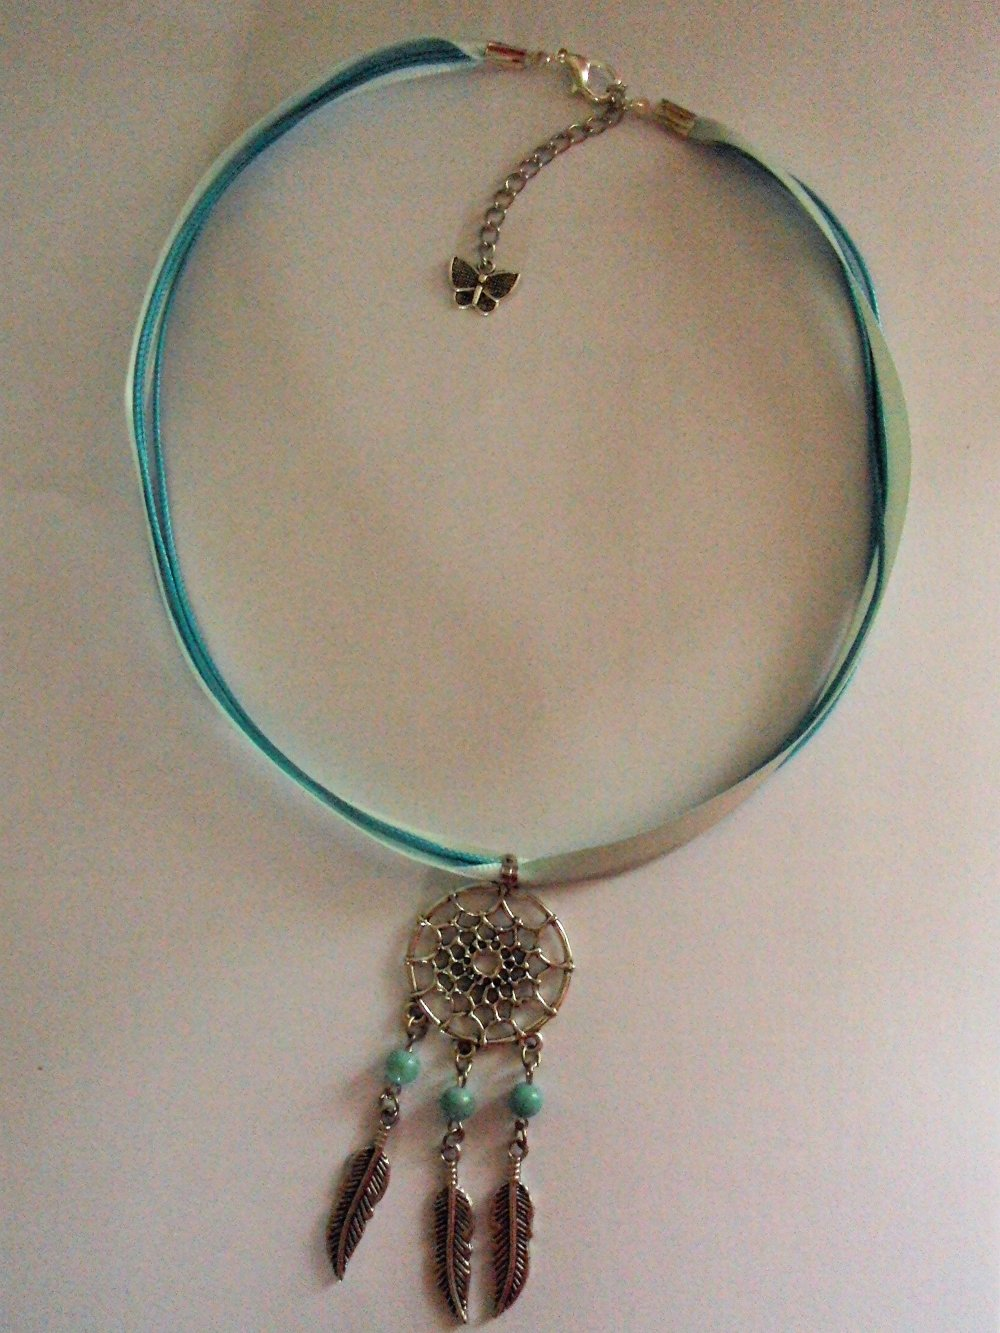 Collier, ras de cou style ethnique, pendentif attrape rêve, vert turquoise